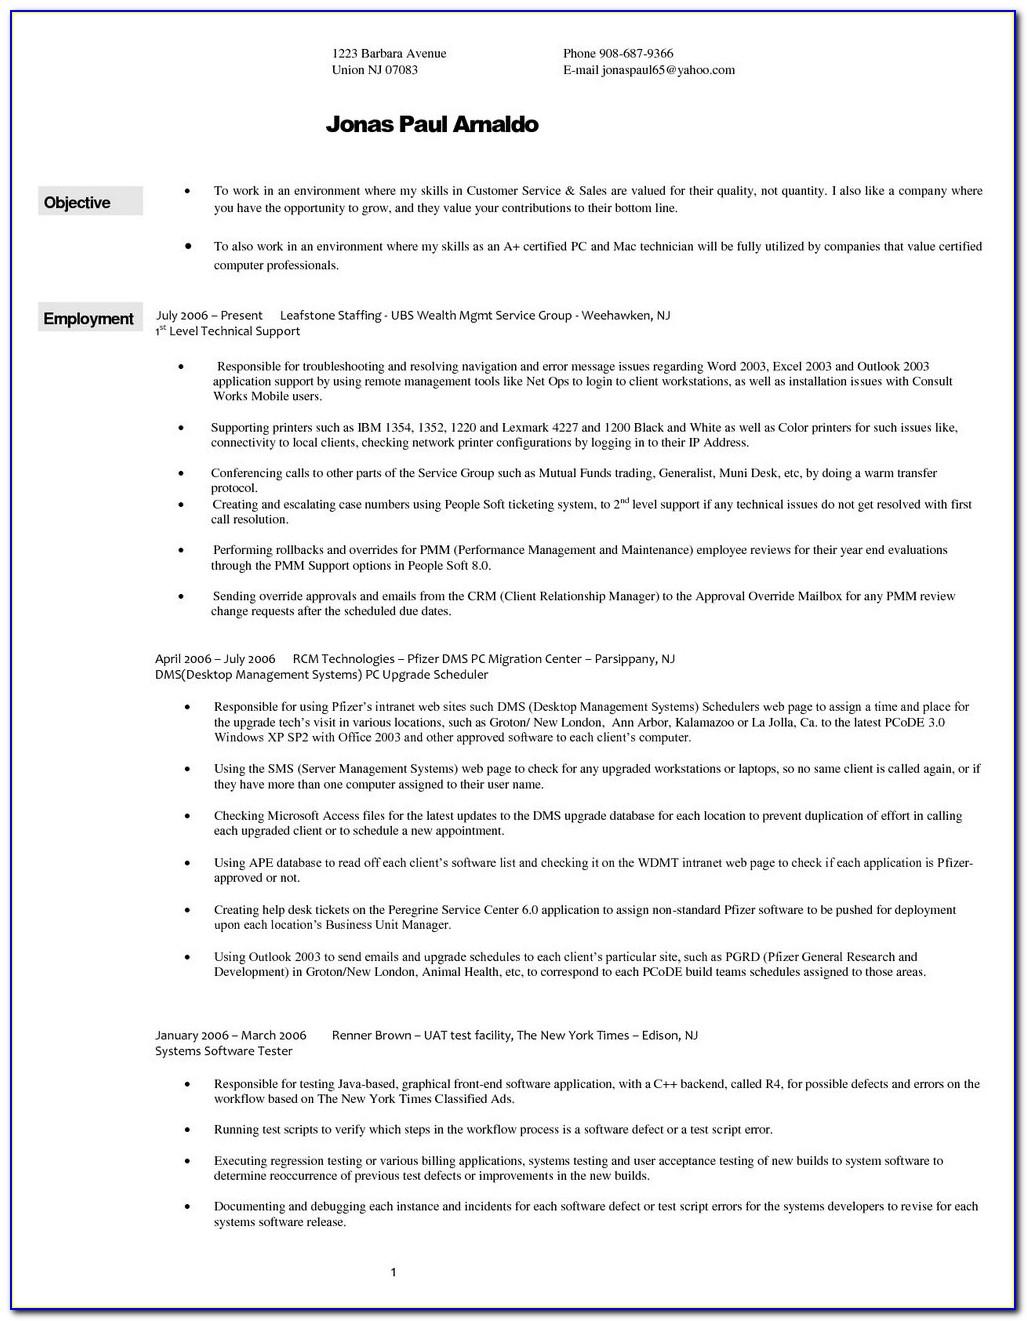 Resume Wizard Word 2003